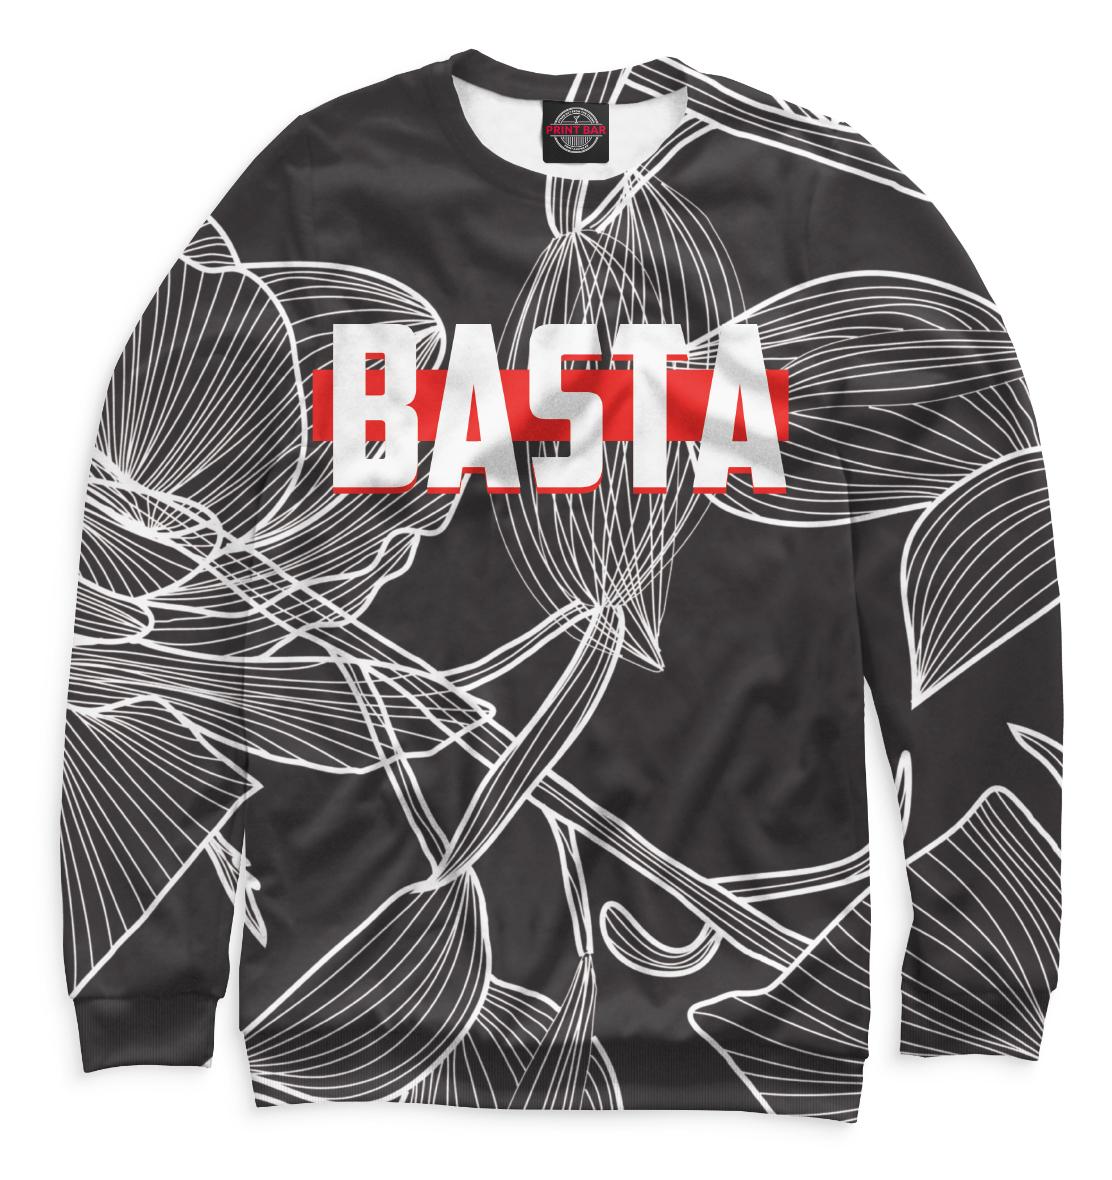 Купить Баста, Printbar, Свитшоты, BST-102363-swi-1